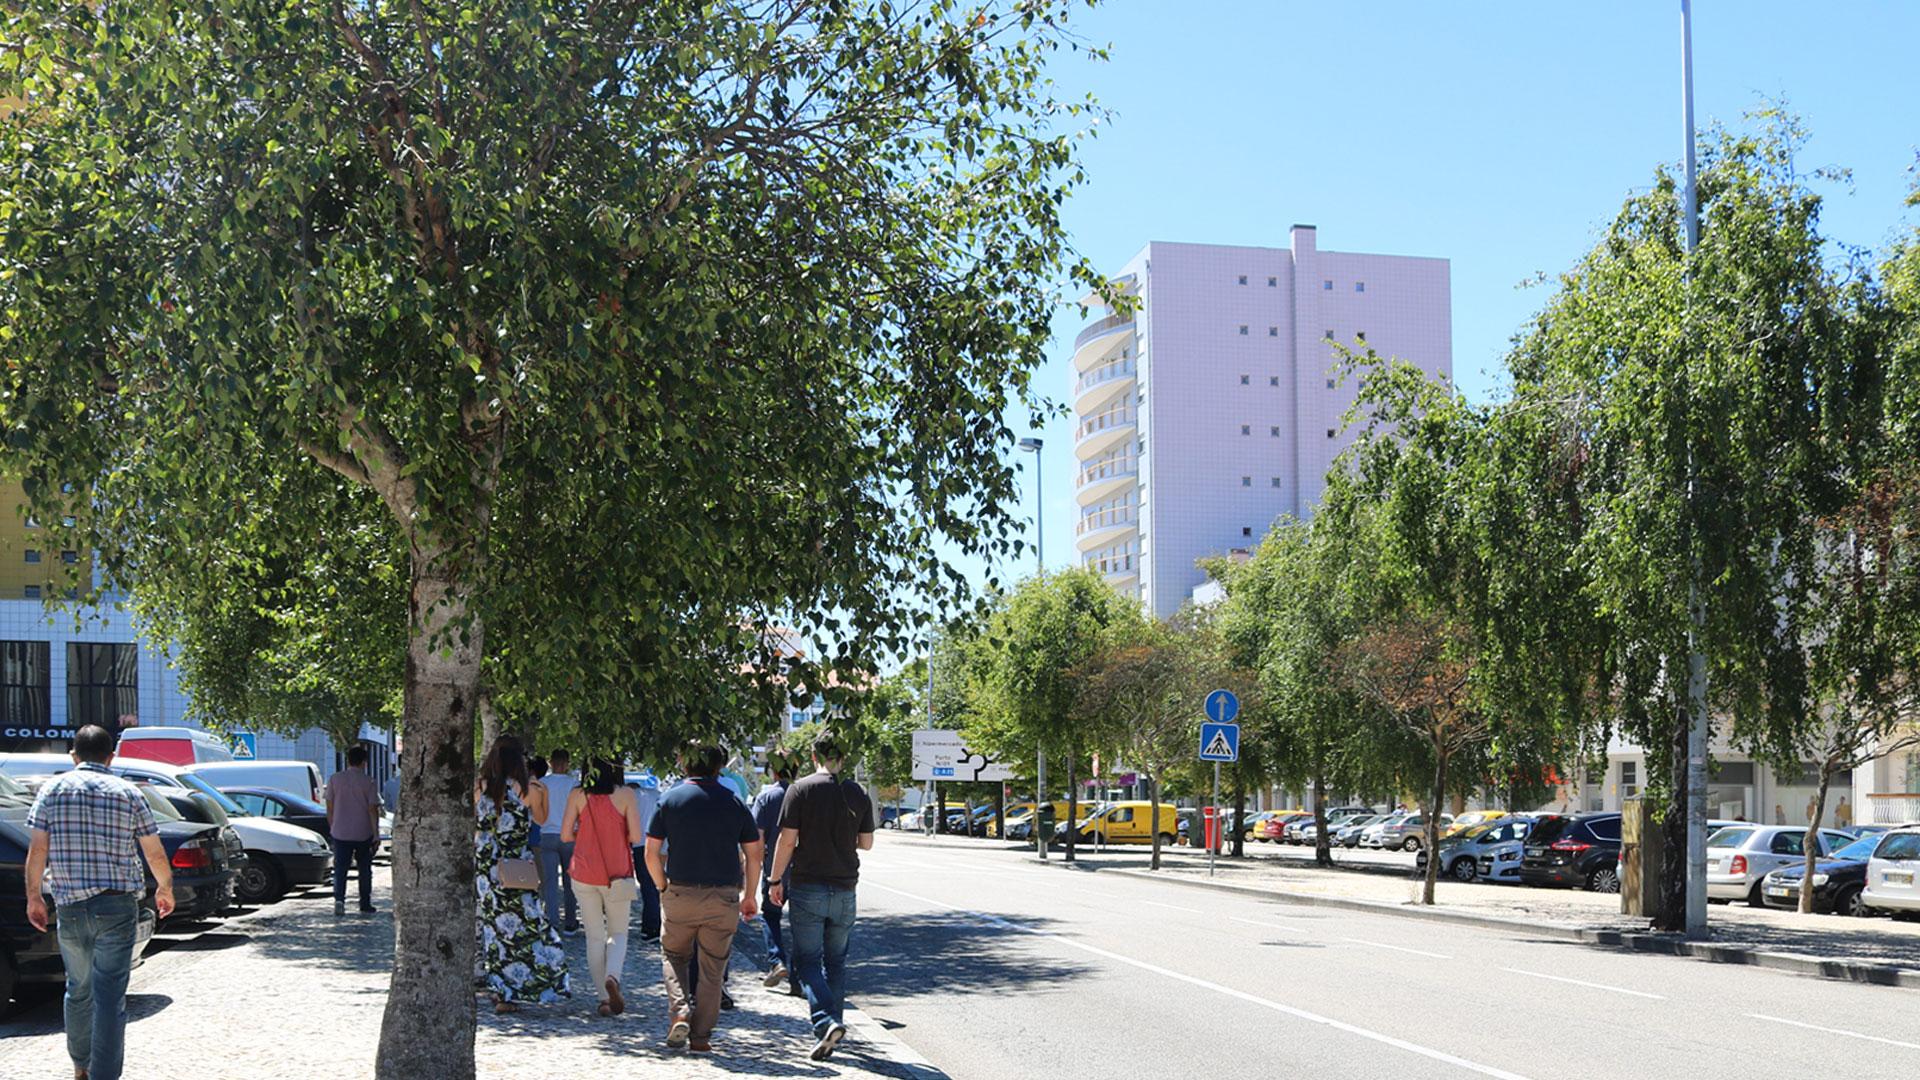 Glicinias-glória-vera-cruz-Aveiro-ville-real-estate-imobiliaria-comprar-arrendar-vender-moradia-apartamento-casa-t0-t1-t2-t3-t4-1